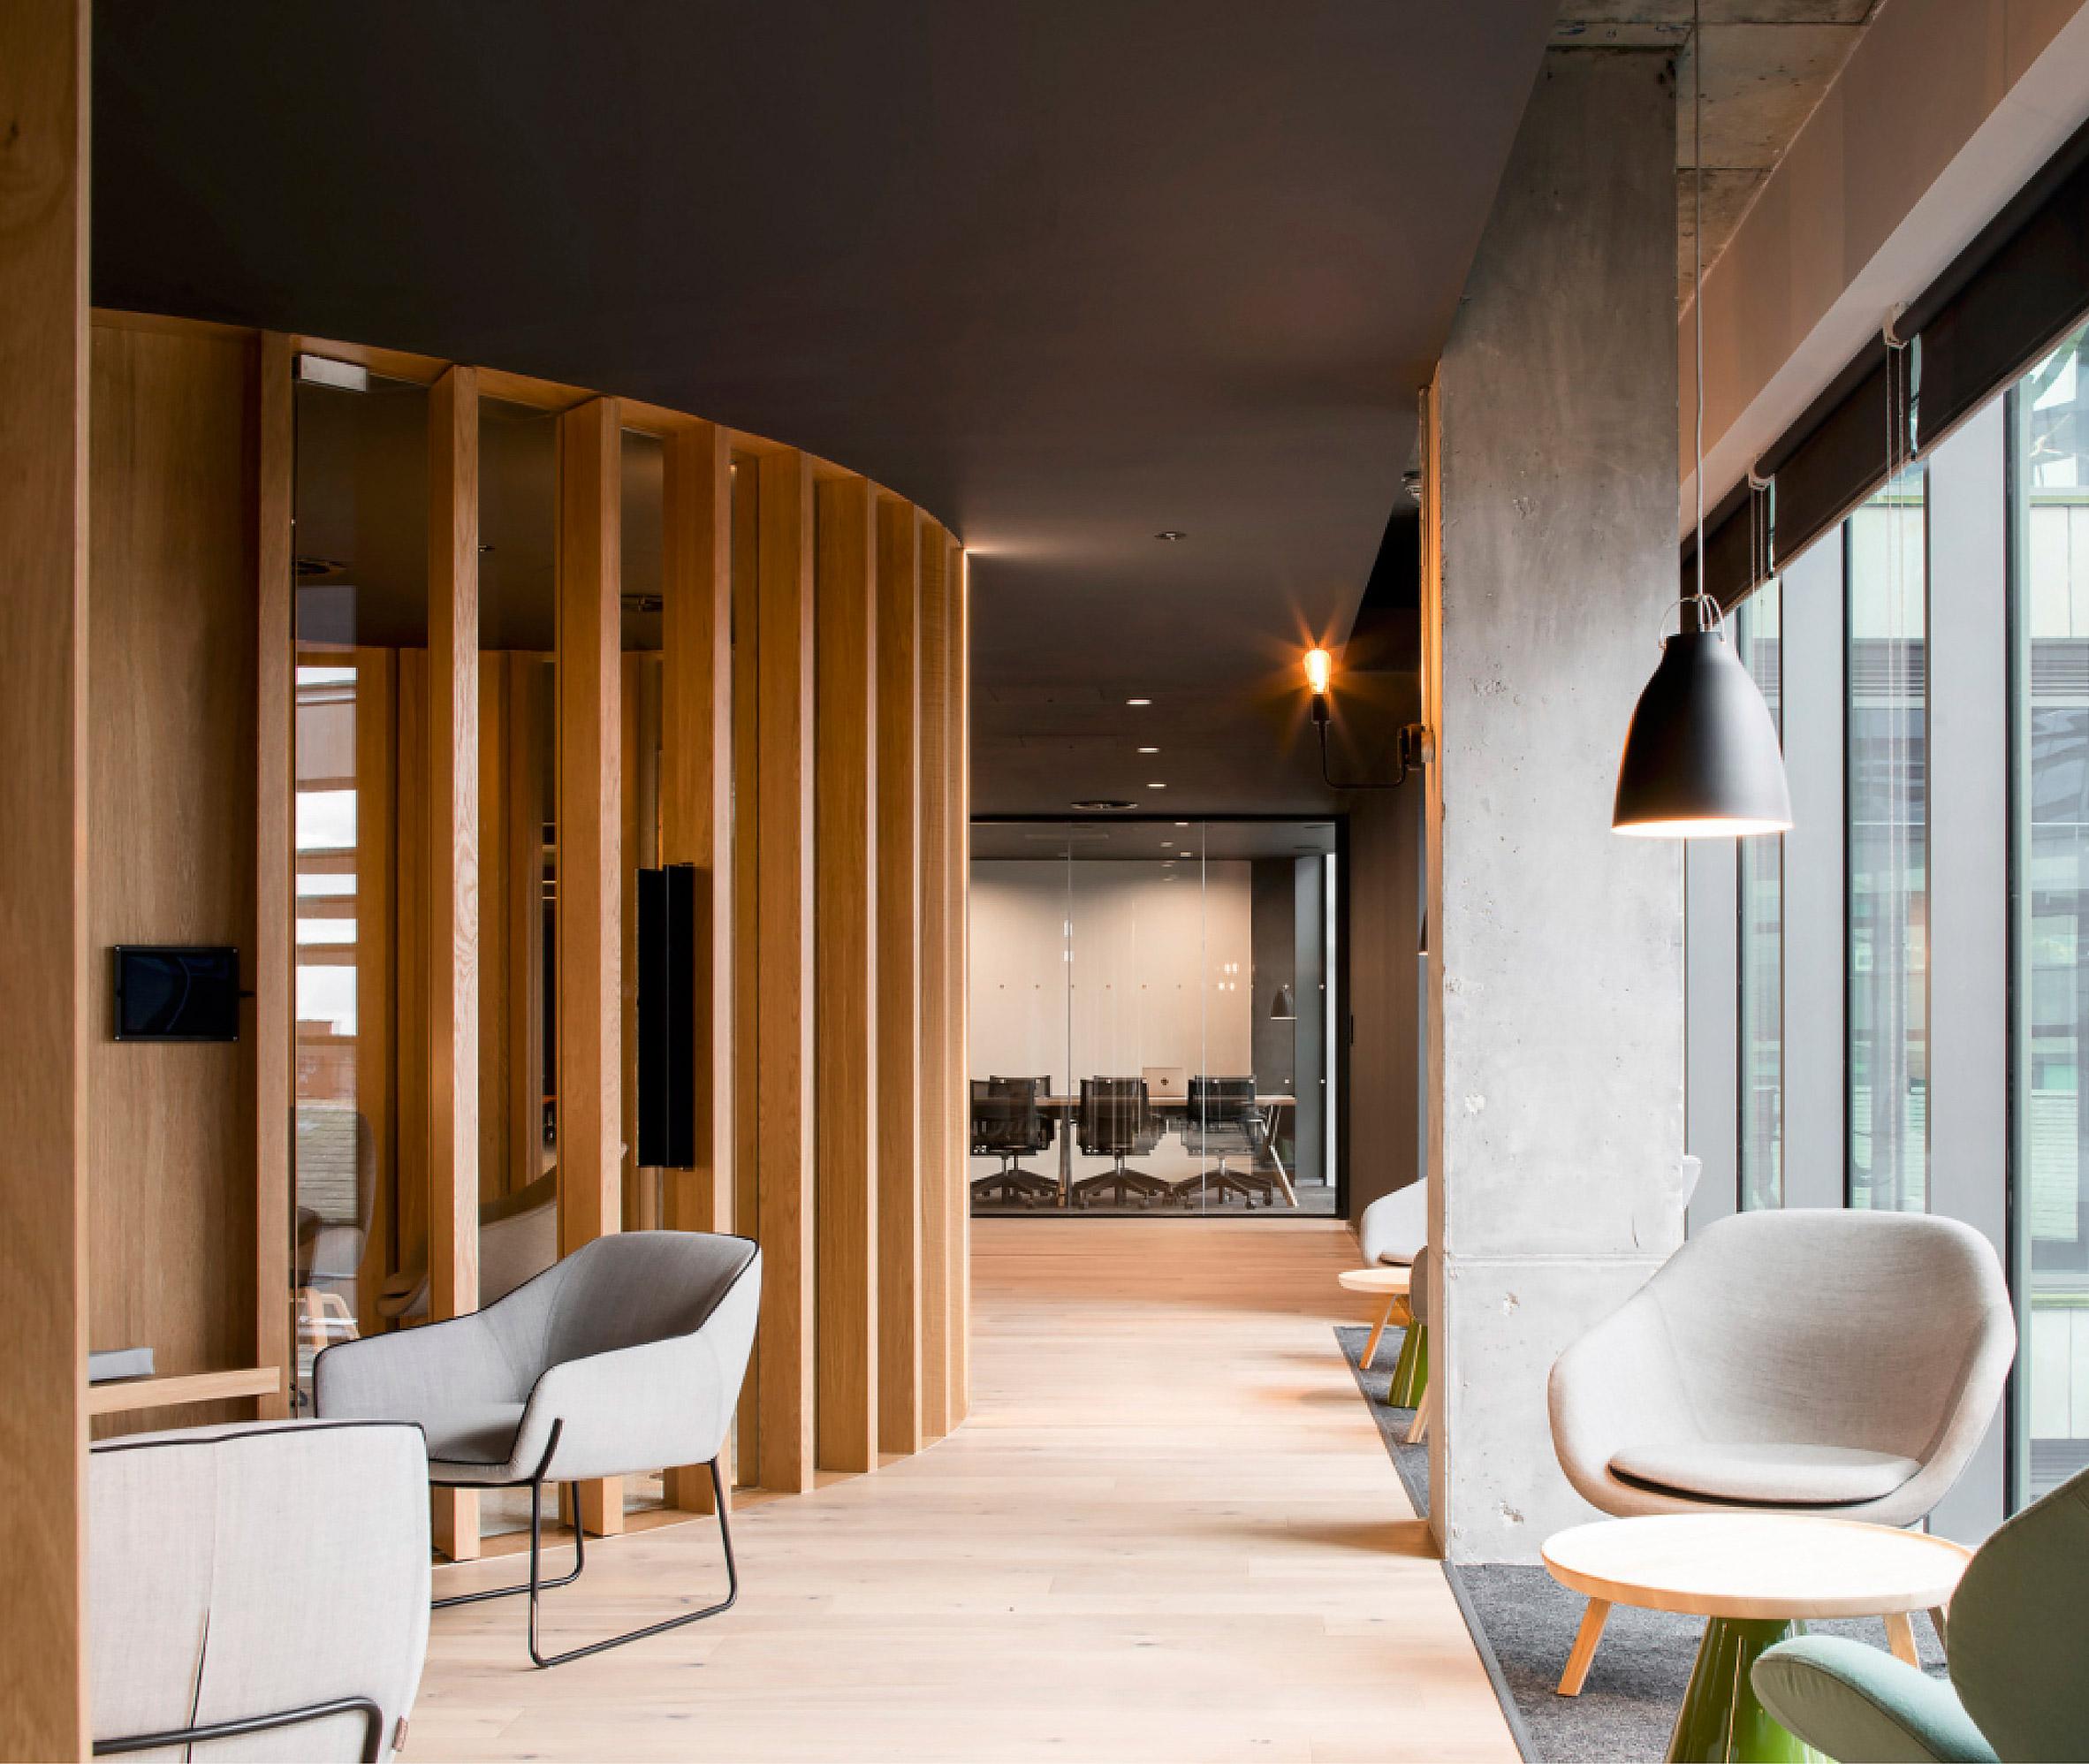 3novices slack s european headquarters eschews bright for New office interior design